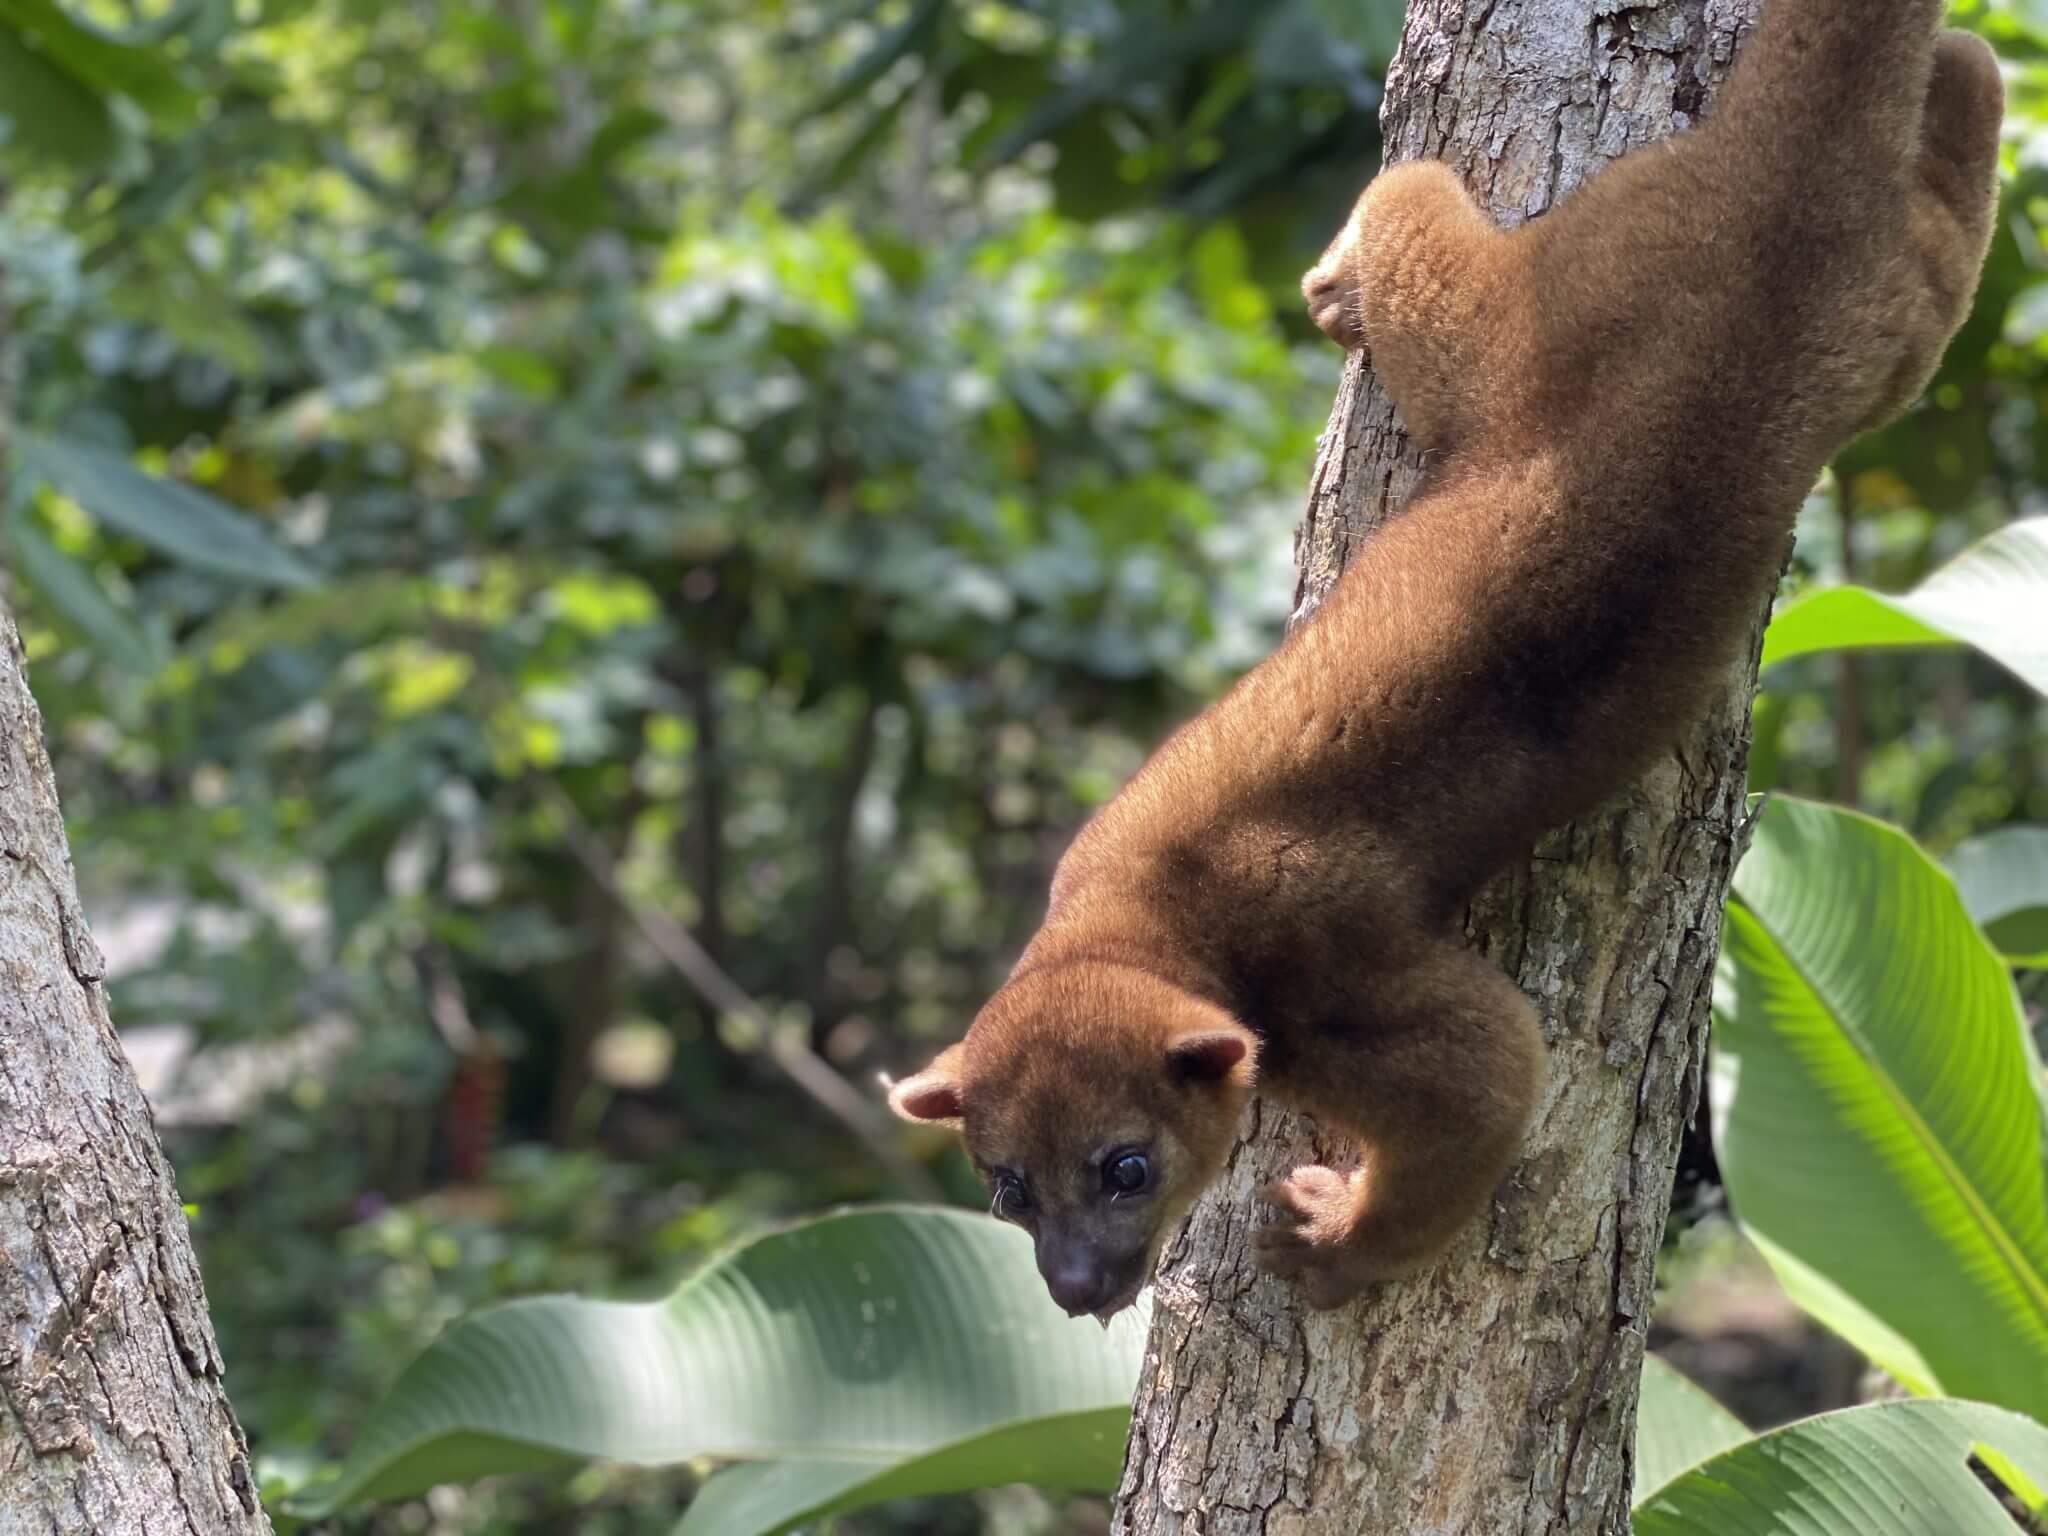 El Kinkajou en Costa Rica, NATUWA Santuario de animales silvestres